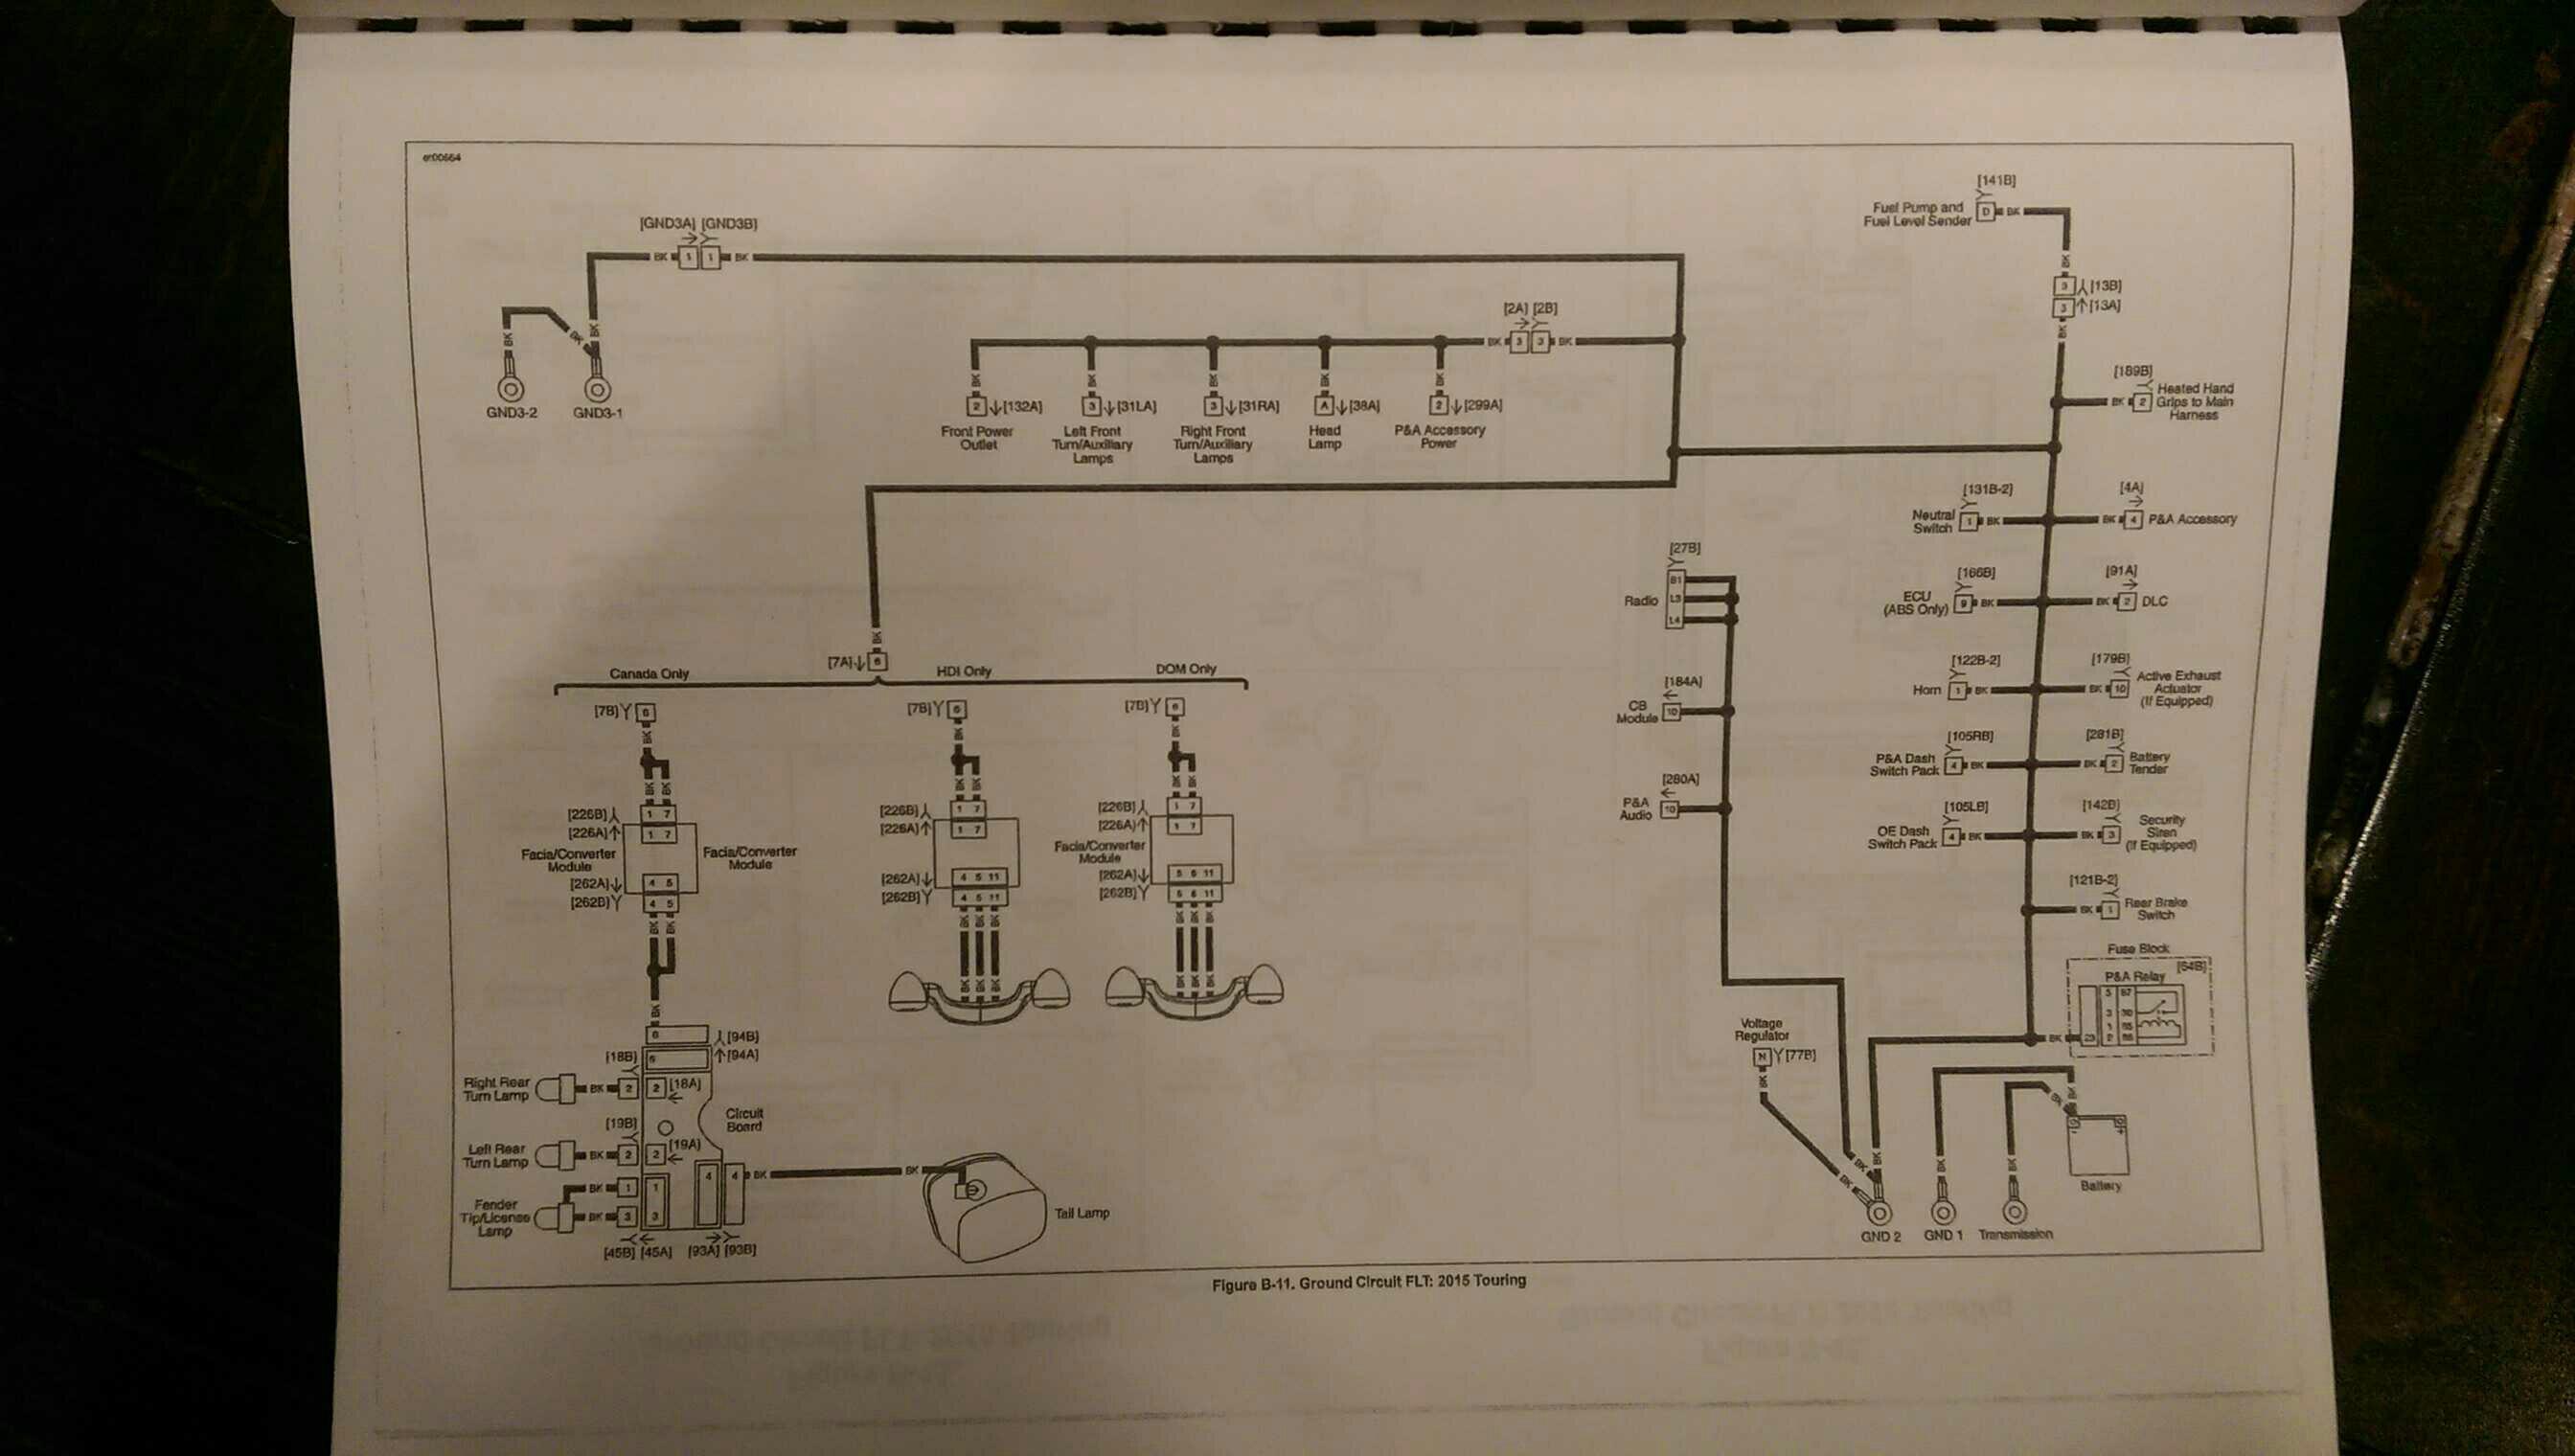 headlight wiring diagram 2016 street glide 2014 taillight wiring diagram needed road glide  2014 taillight wiring diagram needed